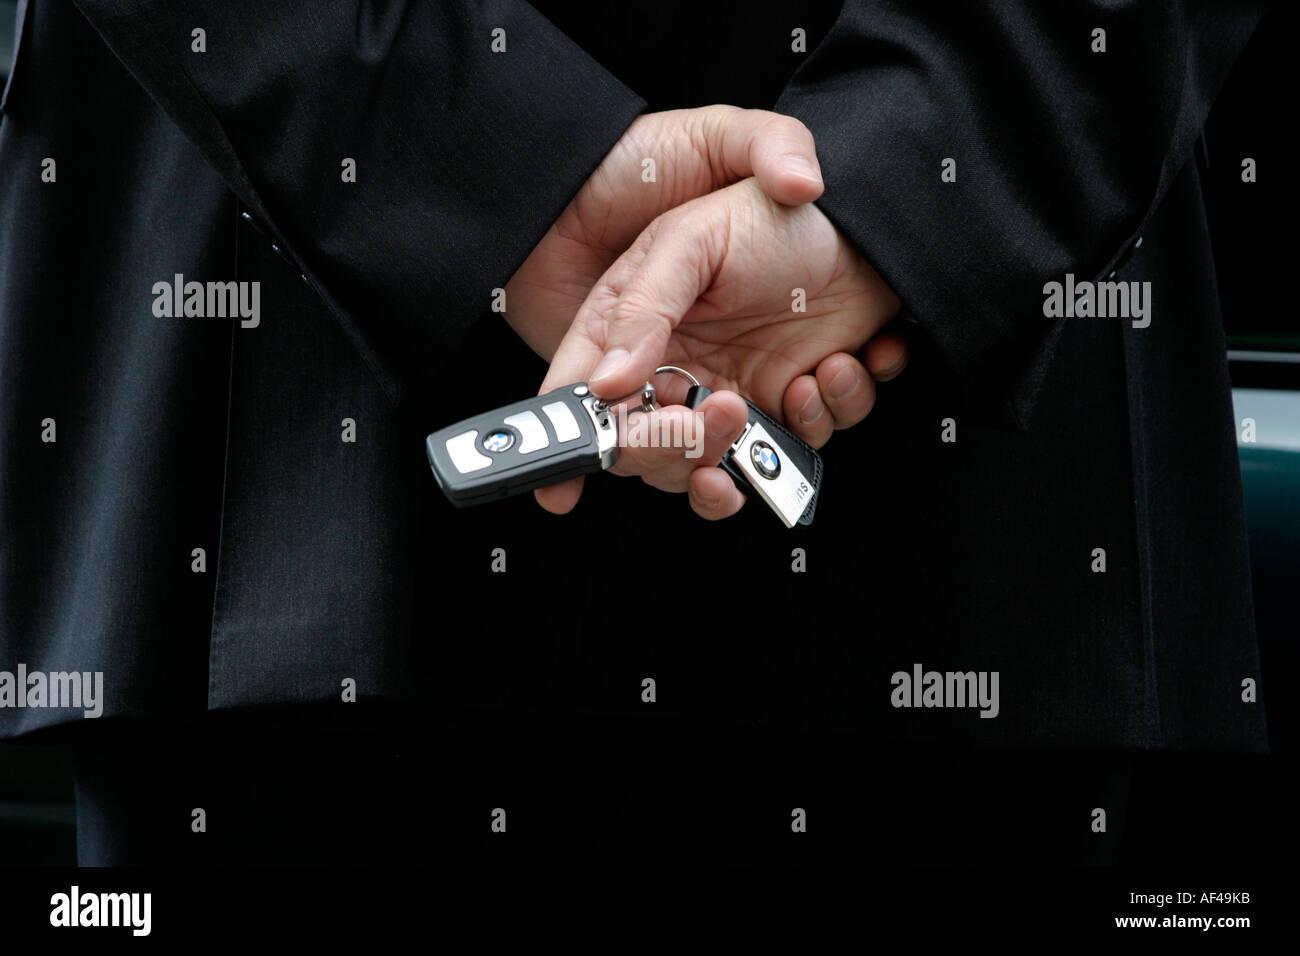 Bmw Car Keys Stock Photos Bmw Car Keys Stock Images Alamy